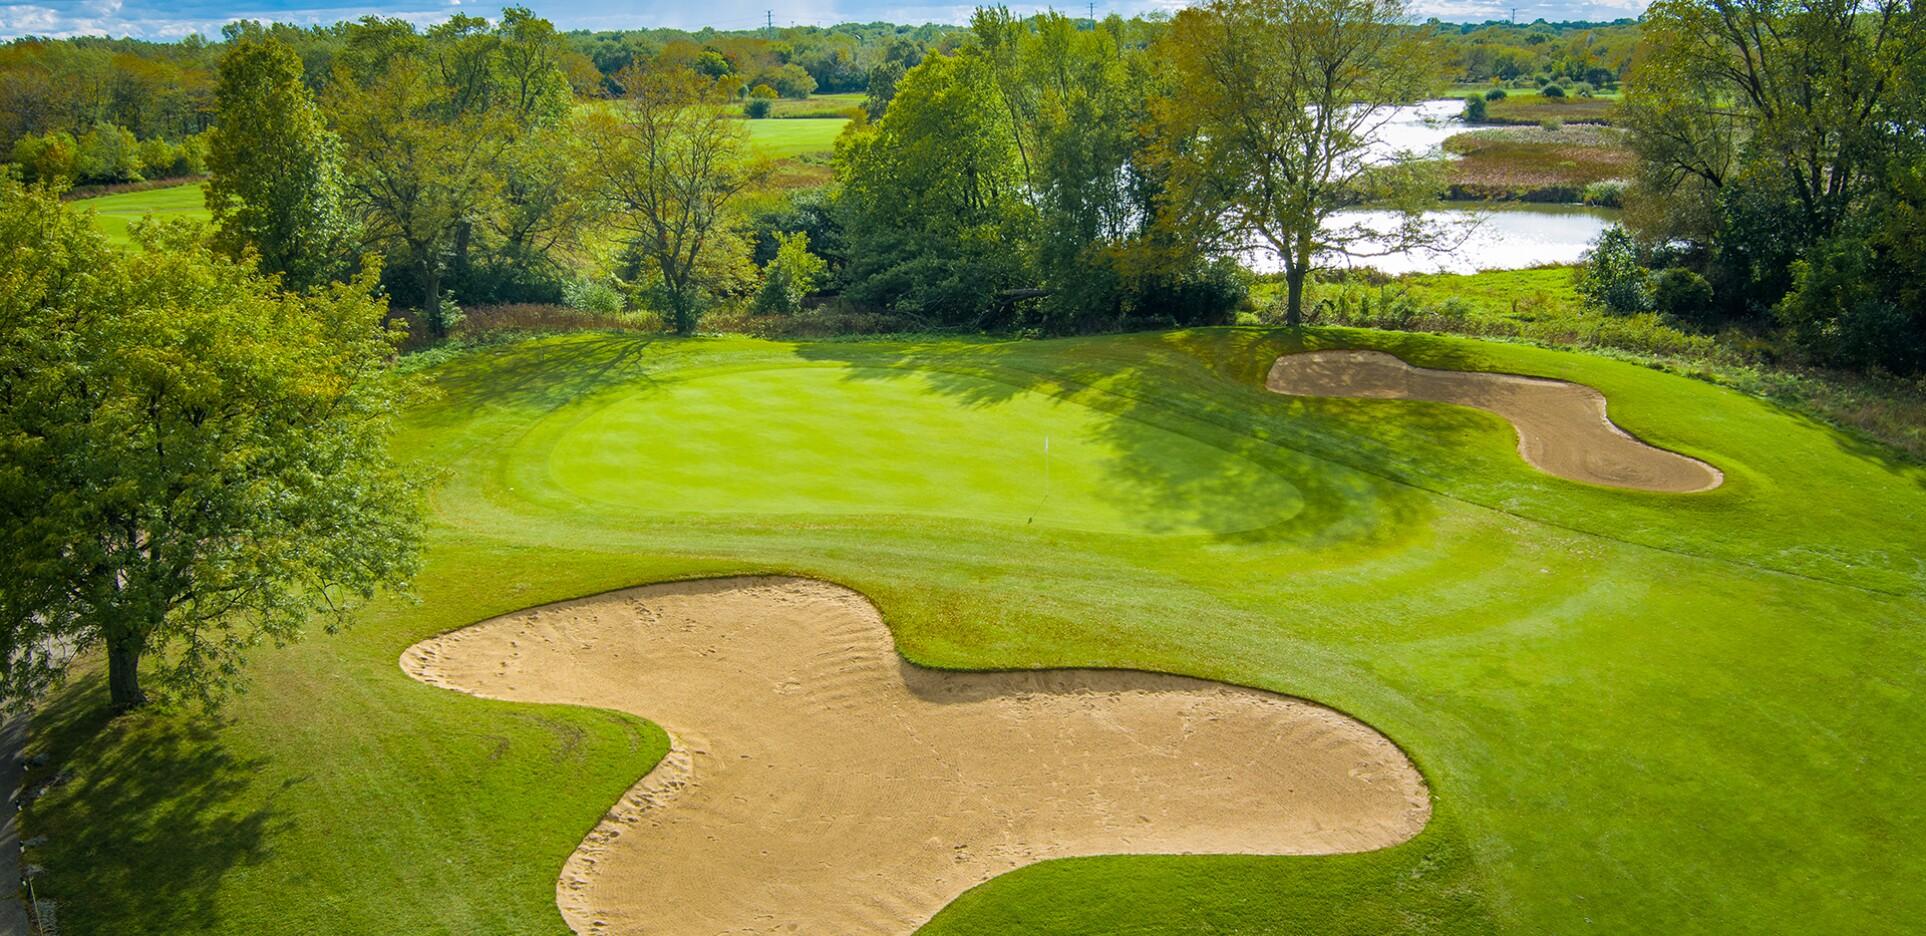 Highland Woods Golf Course in Hoffman Estates, Illinois